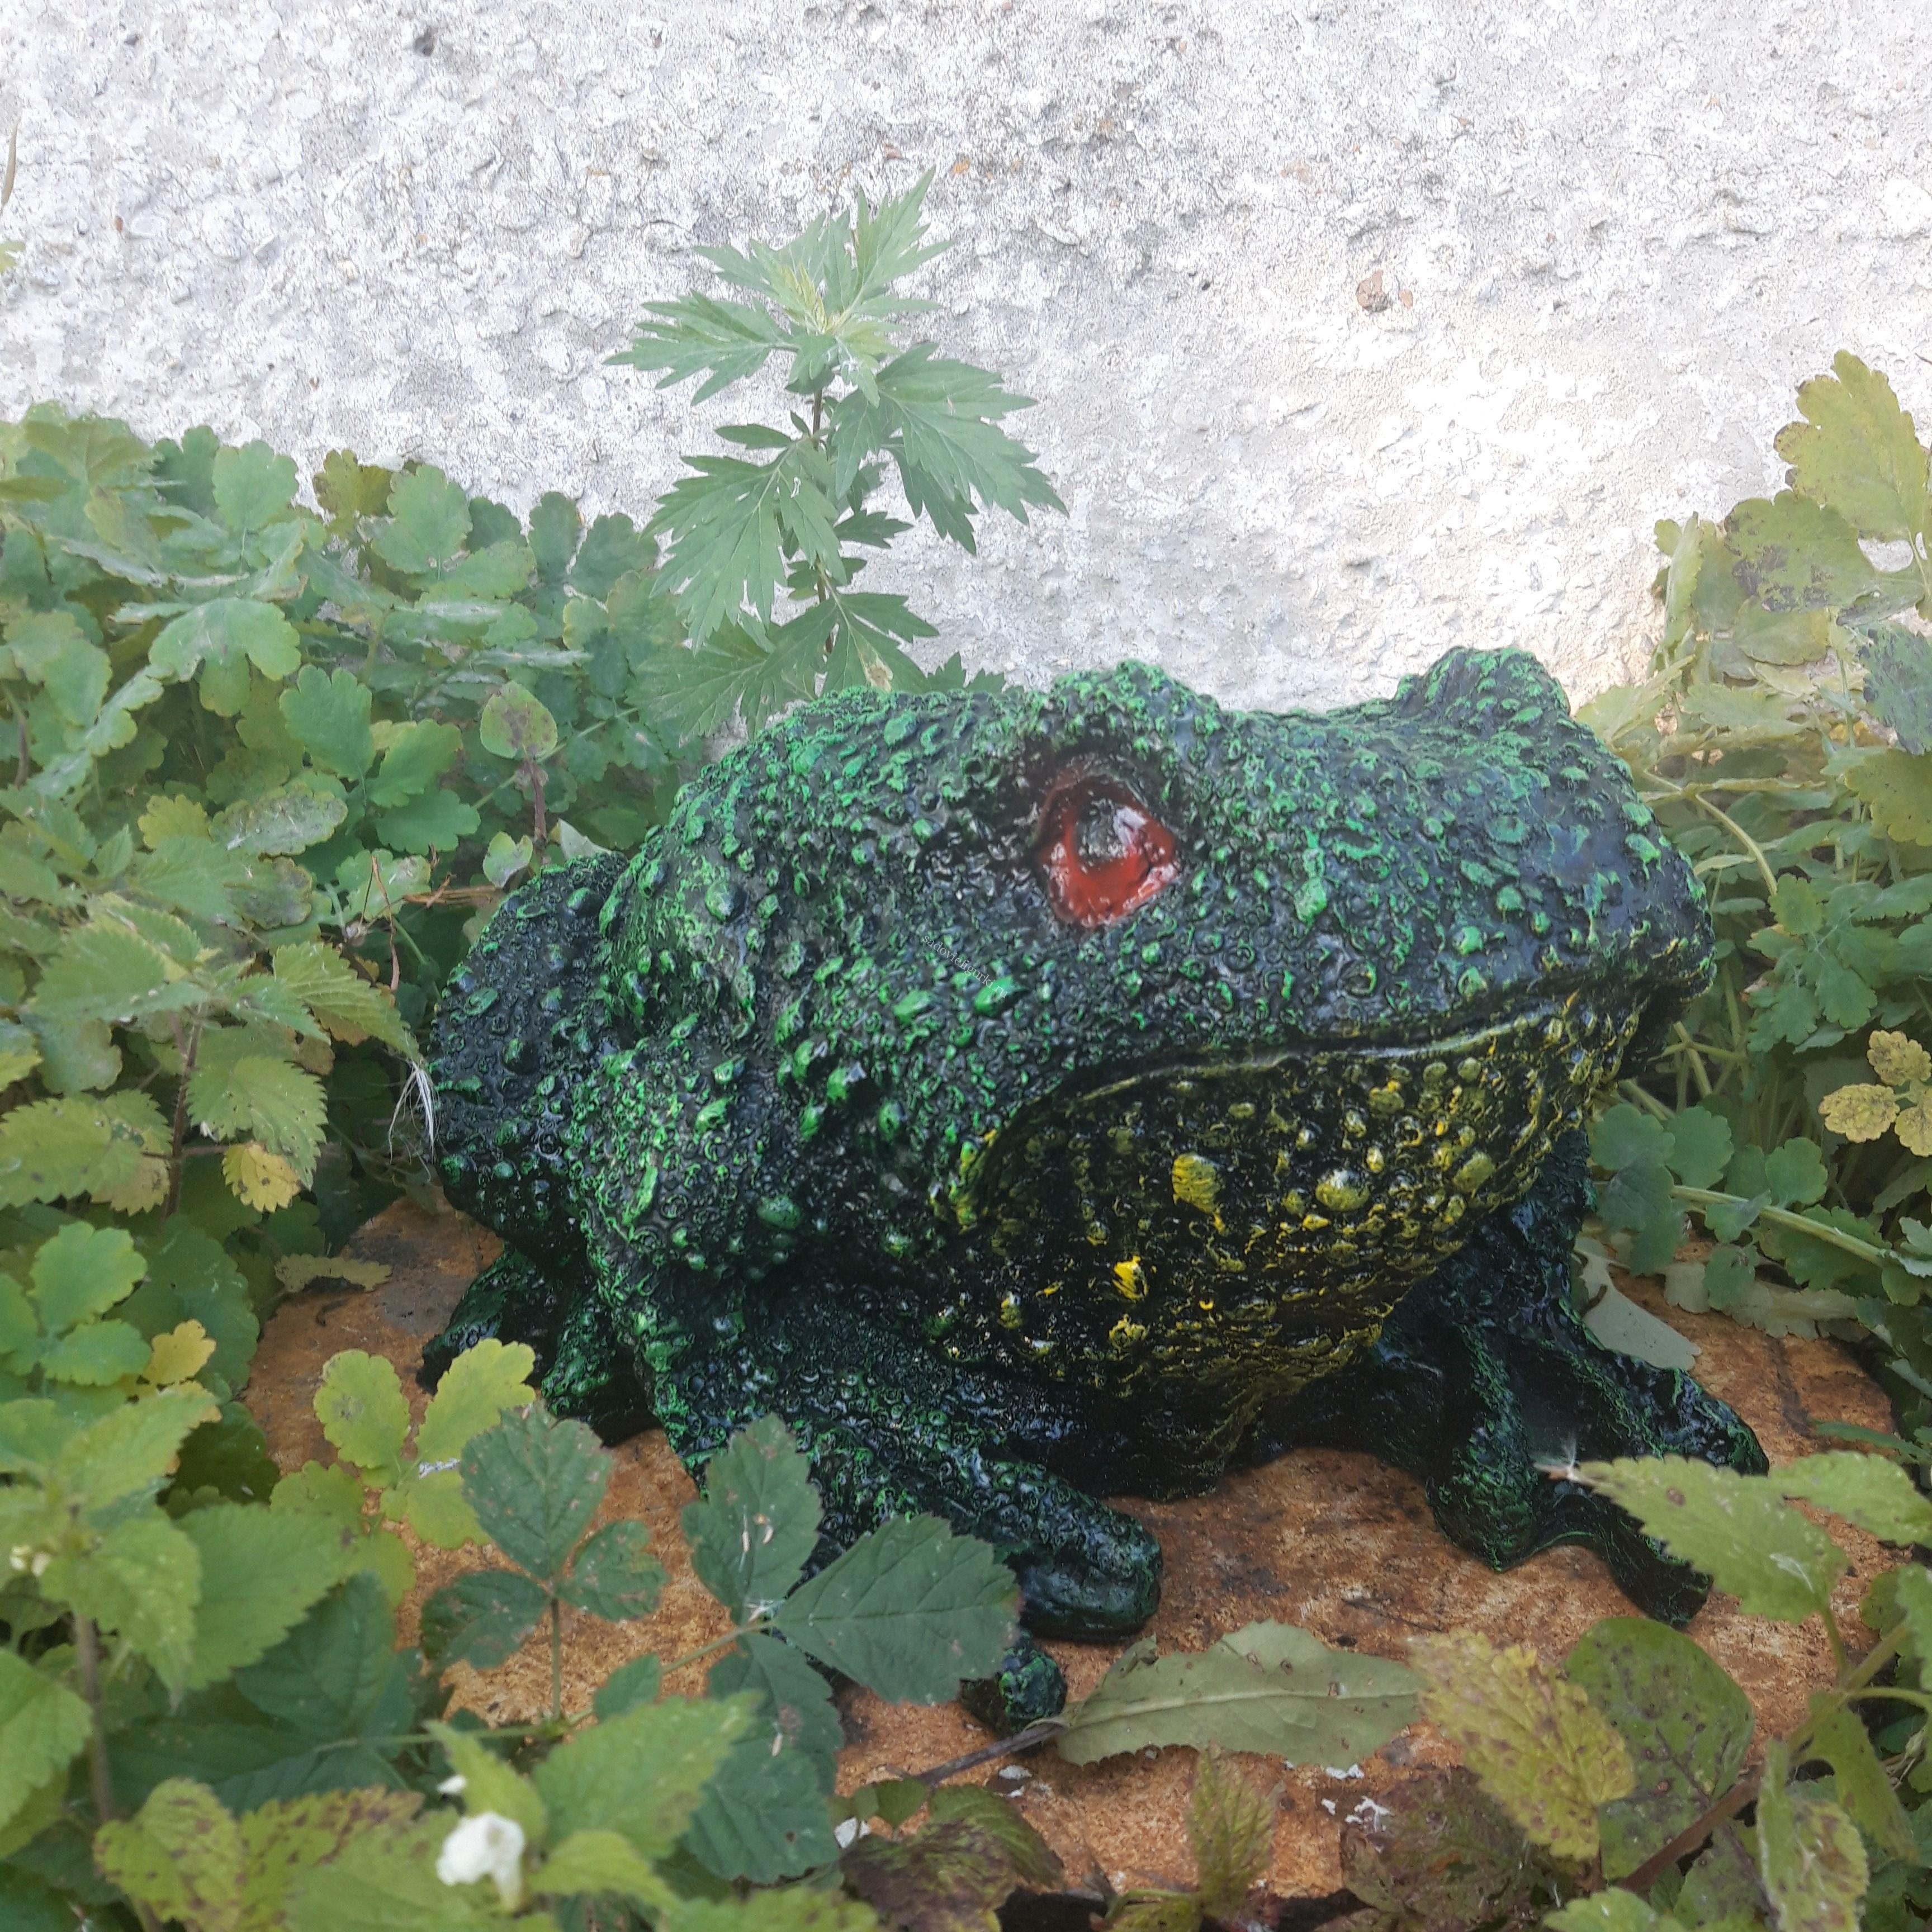 Жаба большая